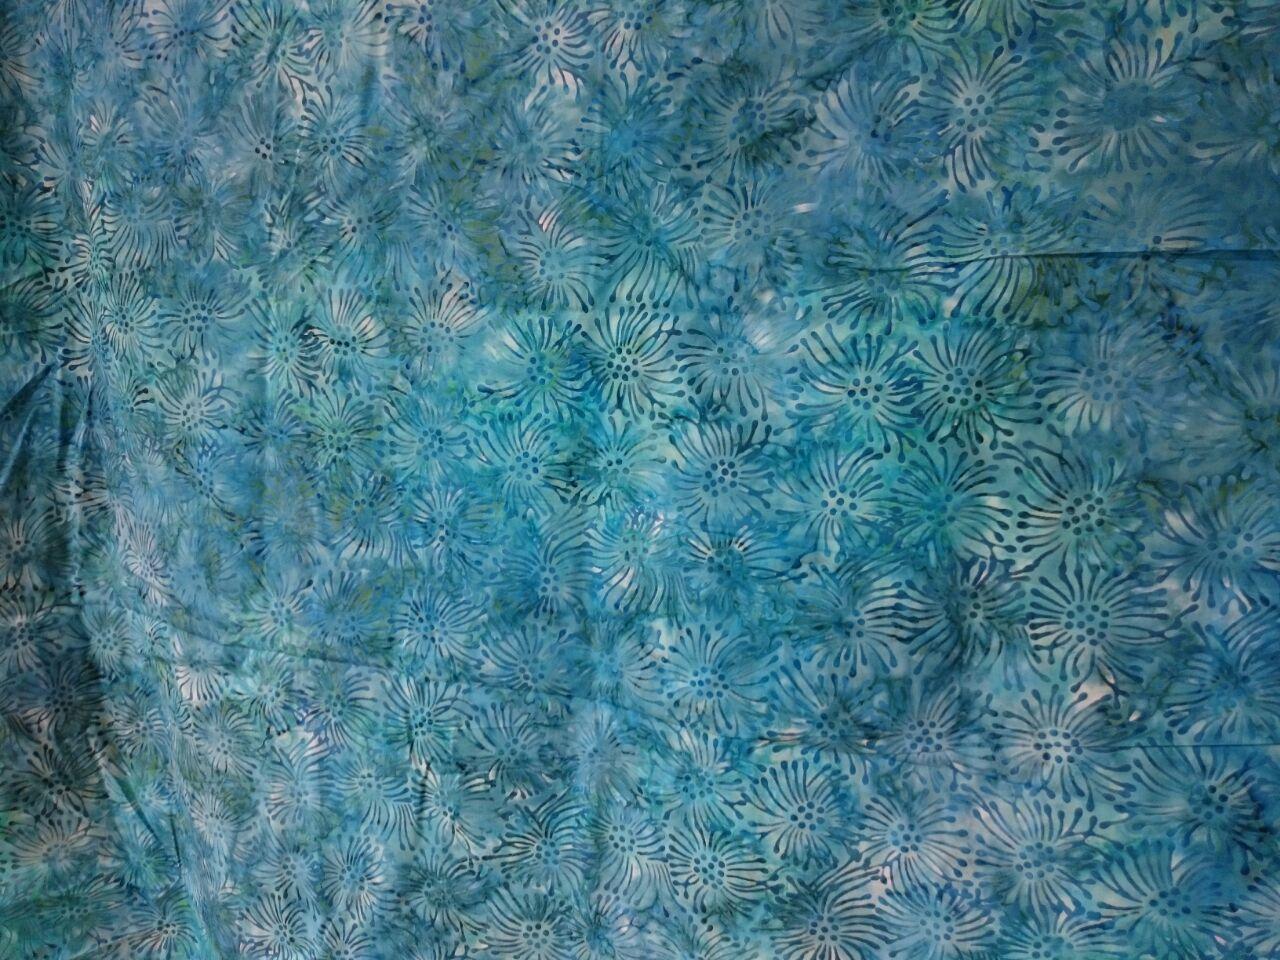 Batik sarong San Diego, California the best handmade